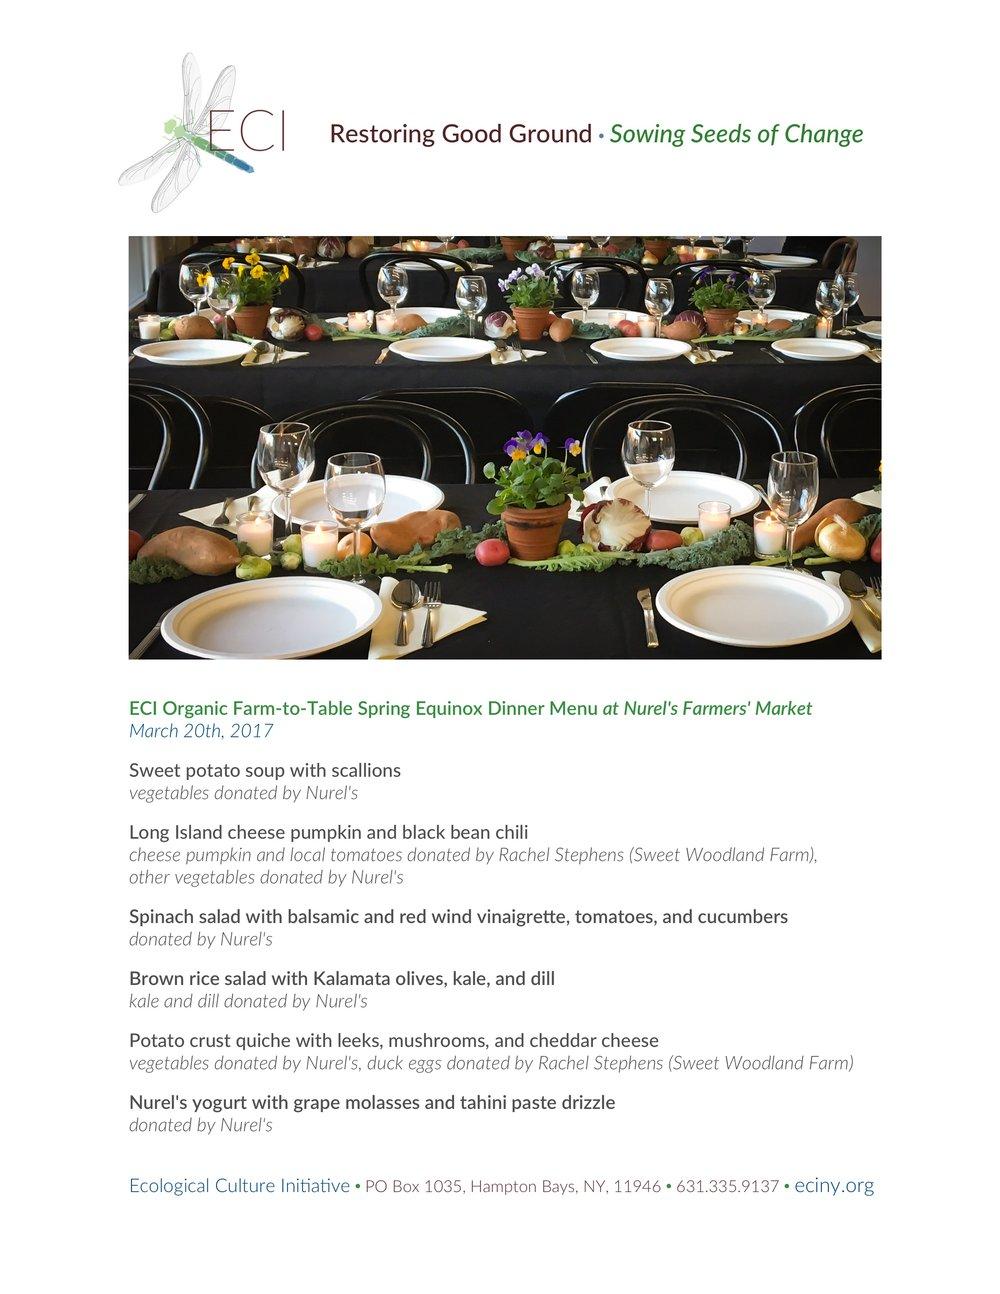 Farm-to-Table Spring Equinox Dinner - March 20th, 2017 - 8.5x11 menu.jpg